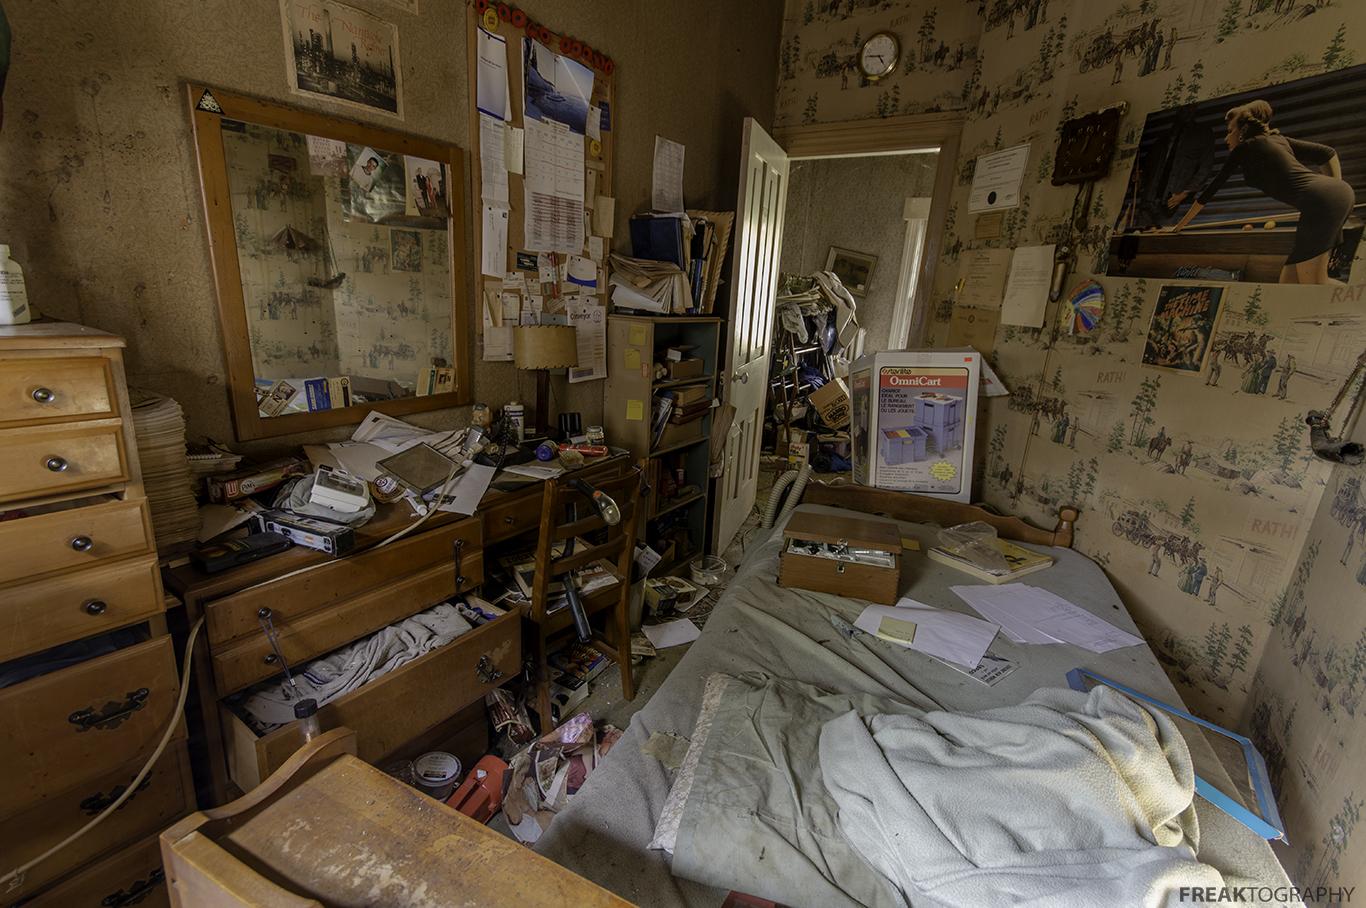 Amazing Kids Bedrooms Abandoned Houses Abandoned Photography Creepy Photography